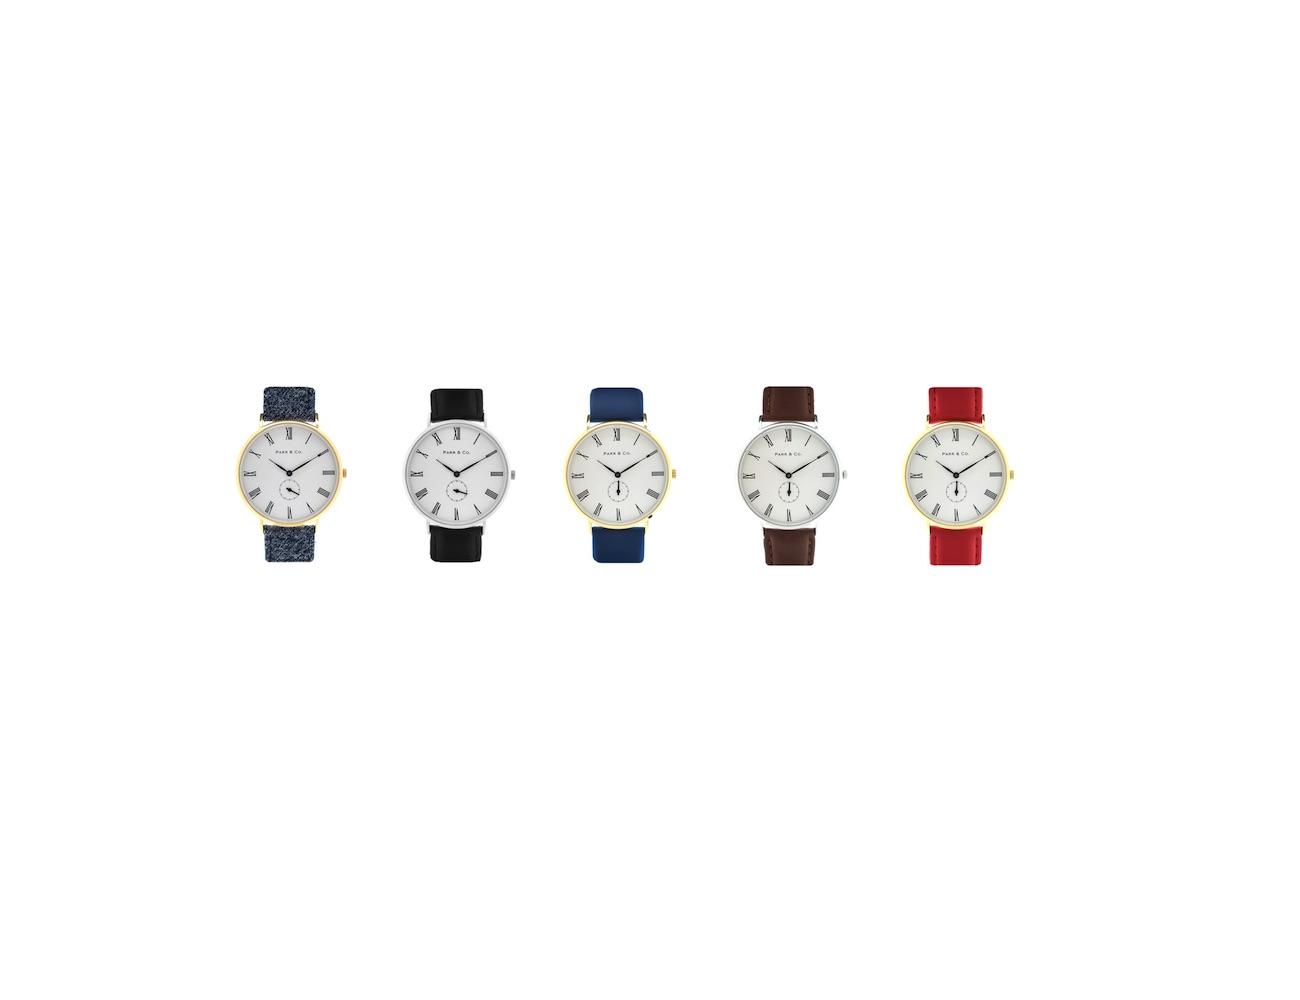 Parr Amp Co Watches